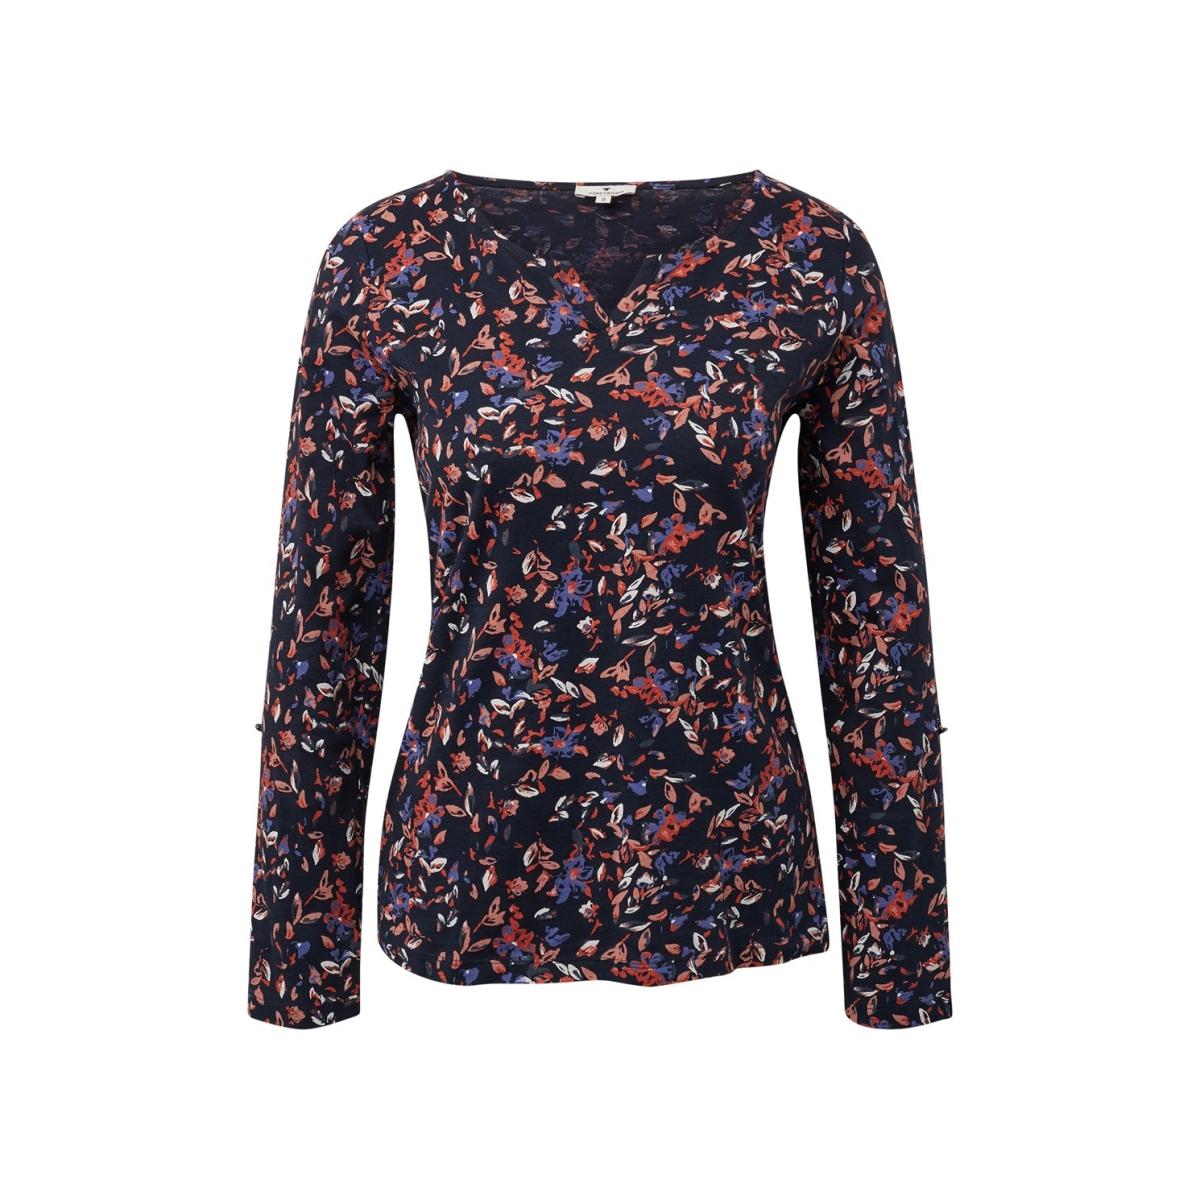 shirt met allover print 1013913 xx 70 tom tailor t-shirt 19885